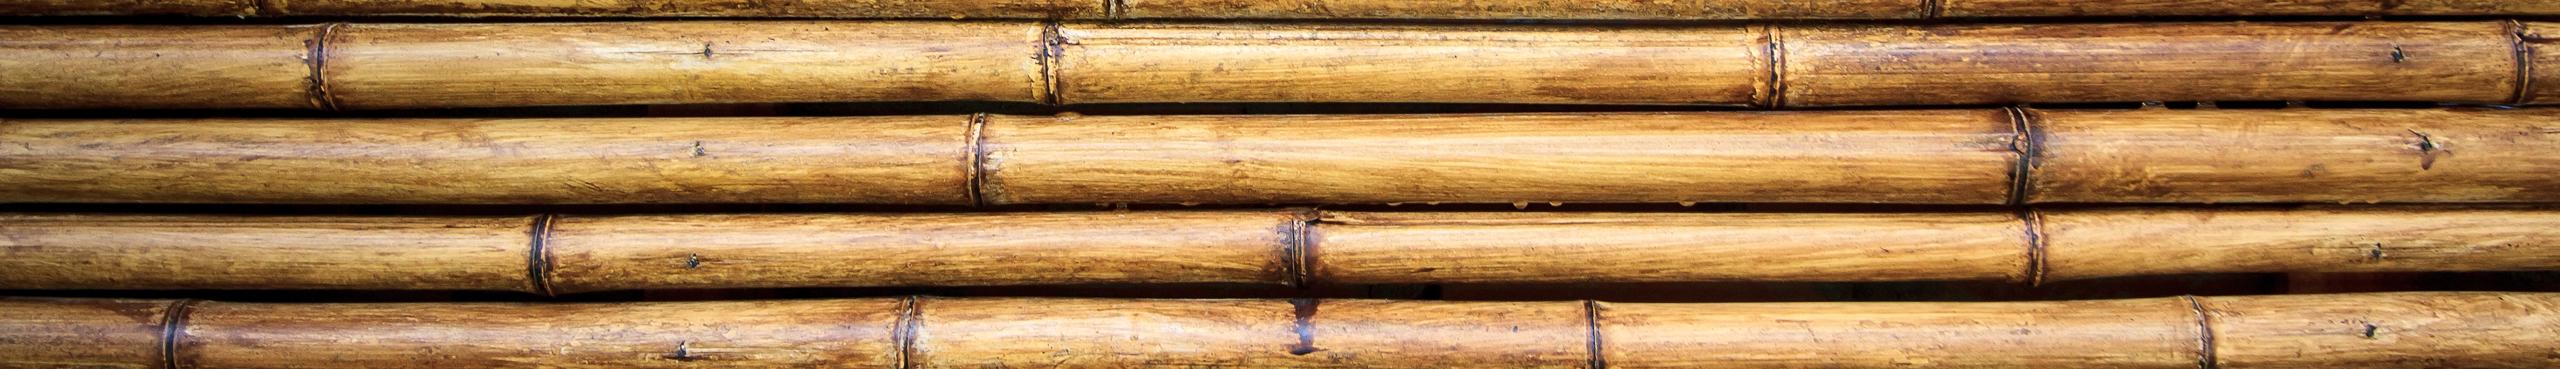 Nursery - Bamboo Stakes